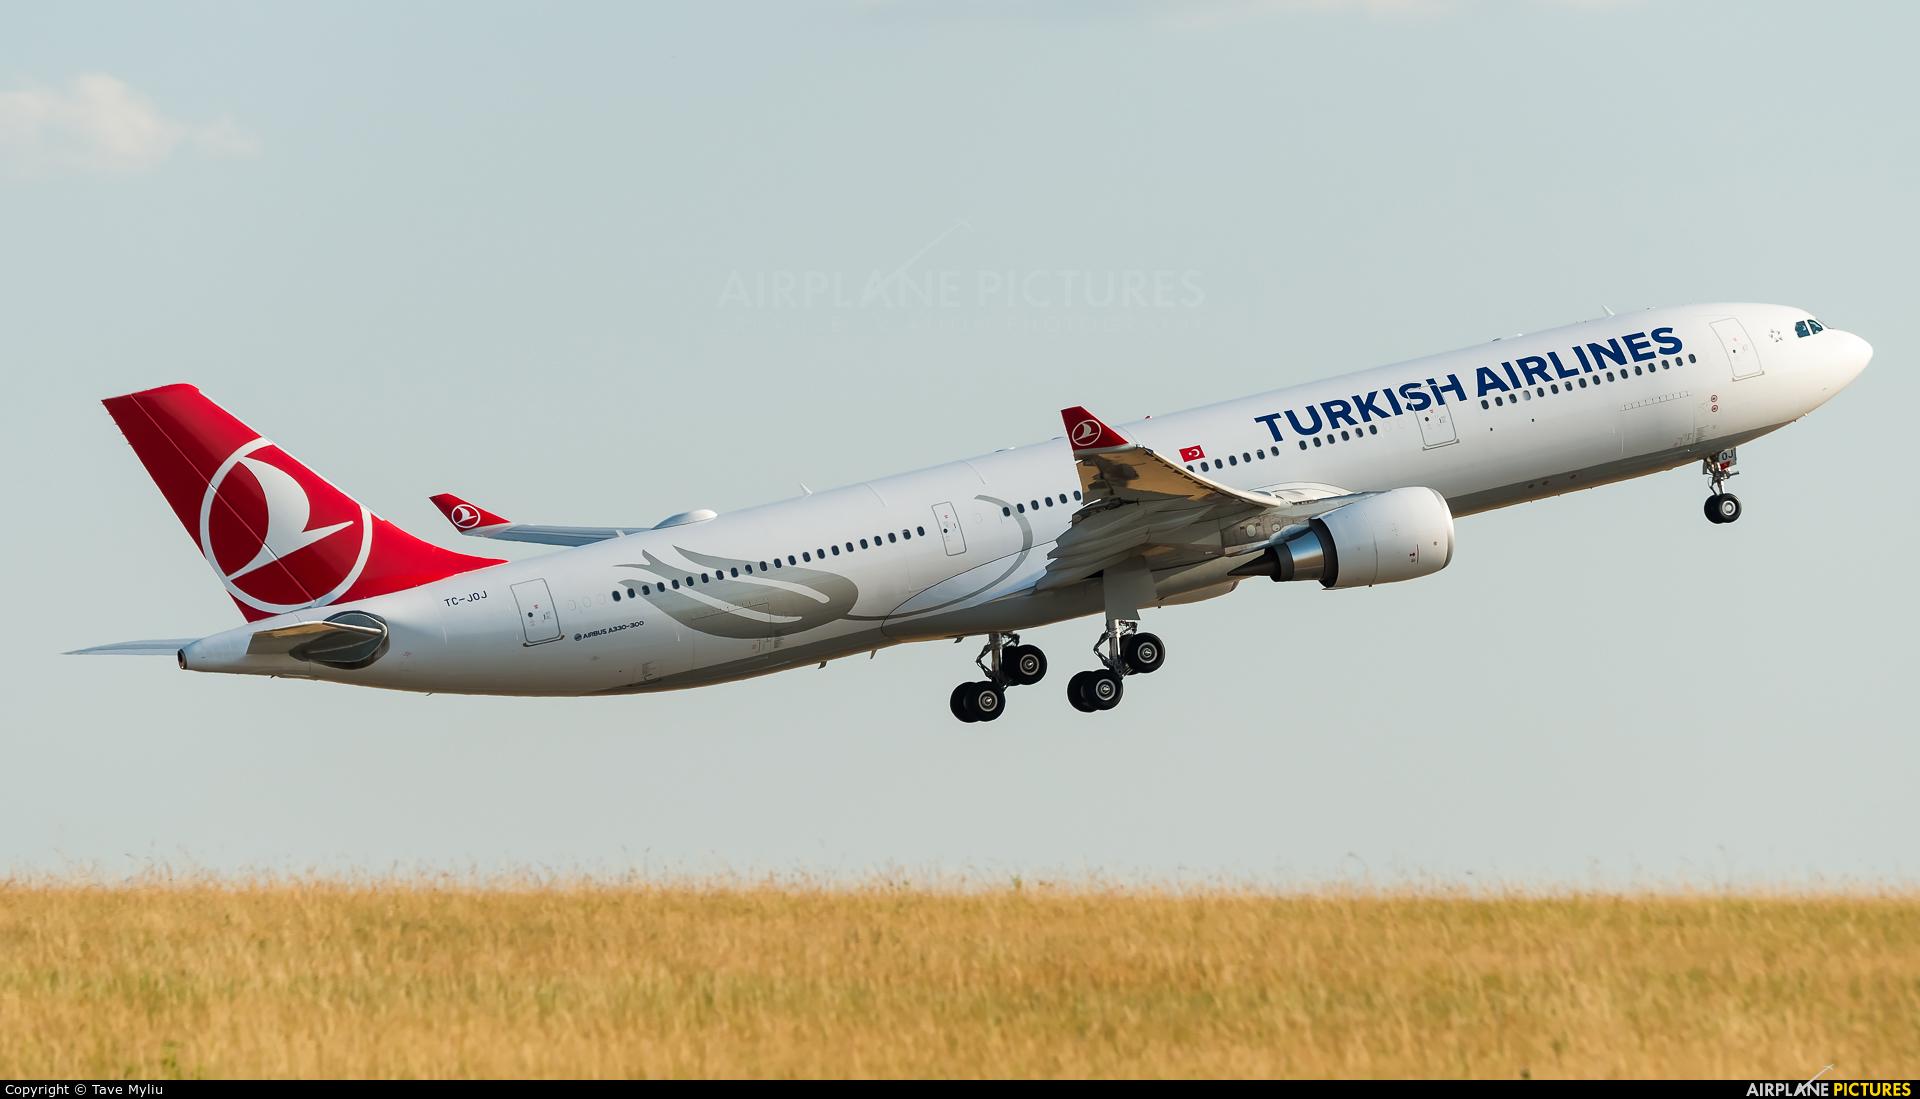 Turkish Airlines TC-JOJ aircraft at Paris - Charles de Gaulle